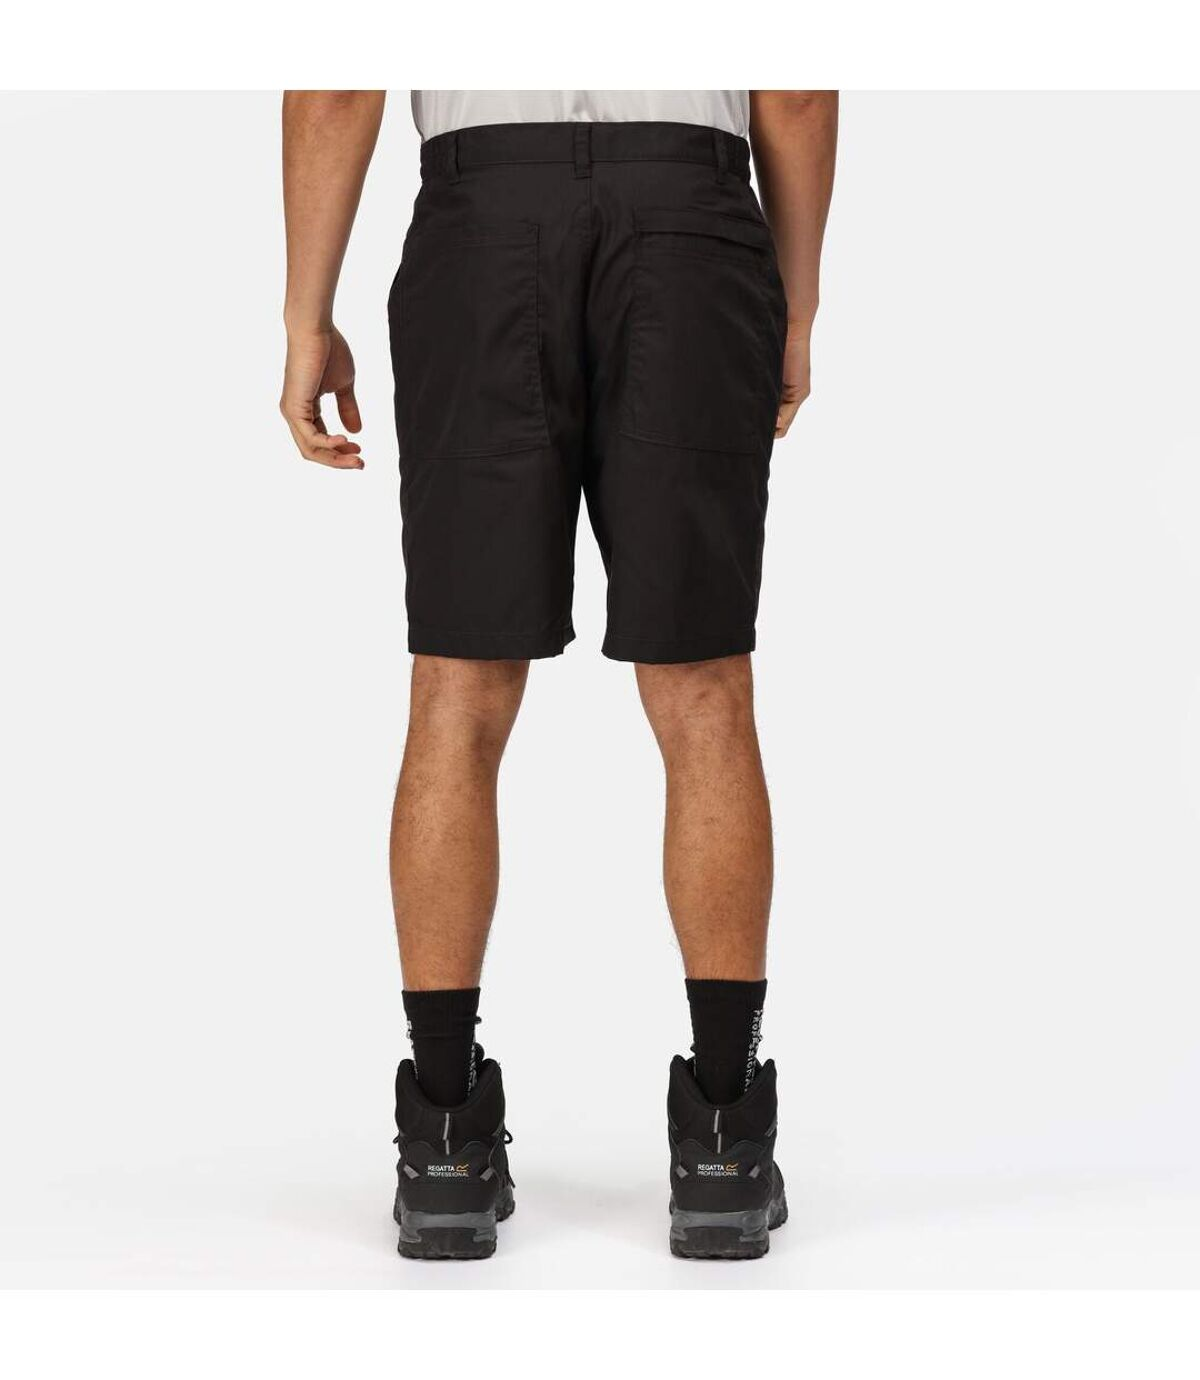 Regatta Mens New Action Shorts (Lichen) - UTRG1500